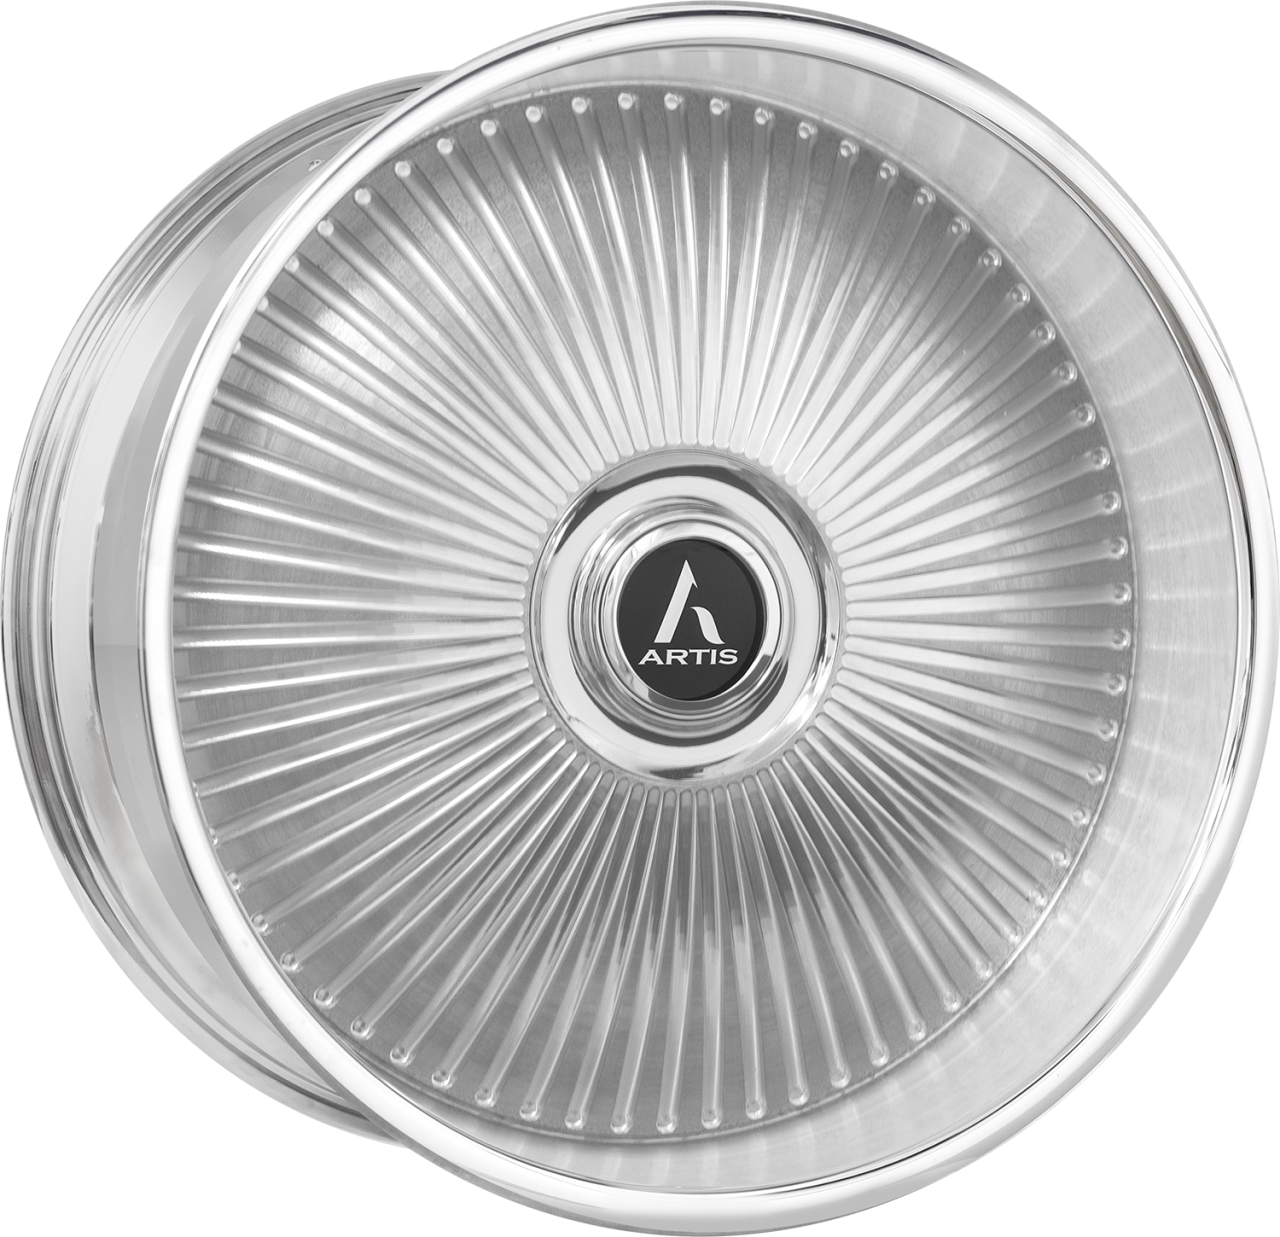 Artis Forged Reno-M wheel with Brushed finish